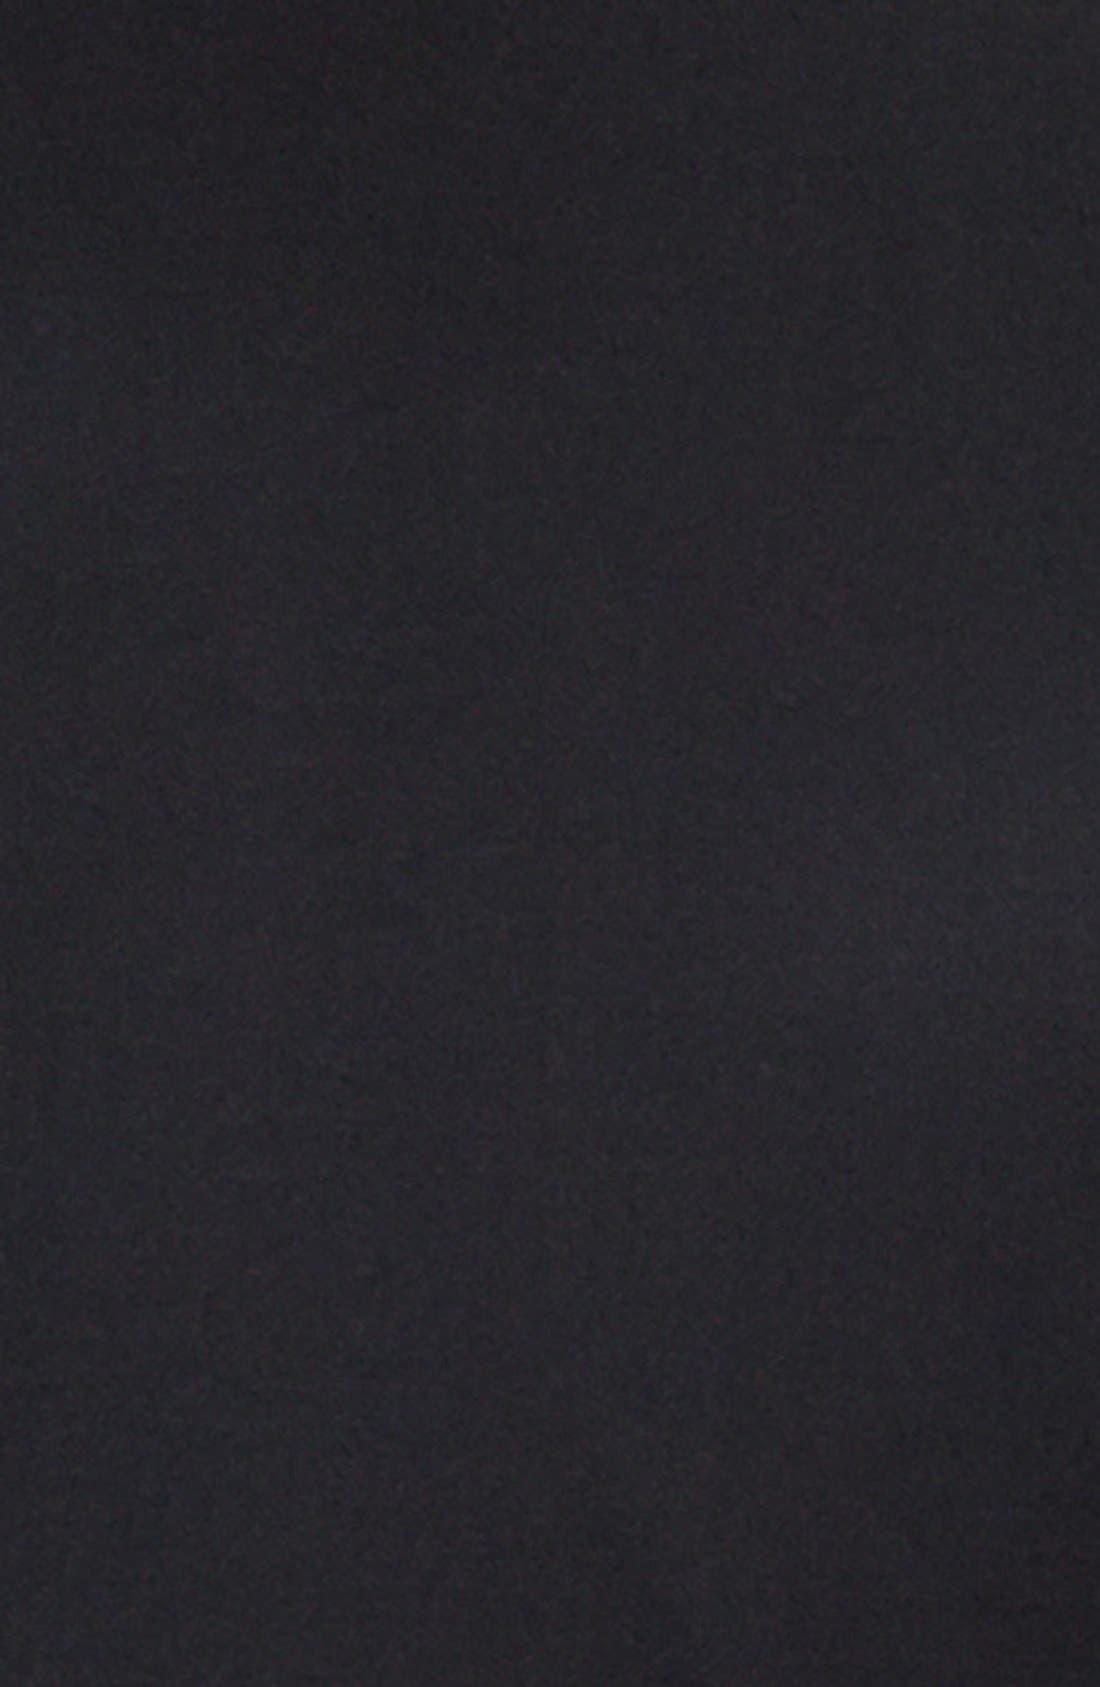 BONOBOS,                             Trim Fit Wool Dinner Jacket,                             Alternate thumbnail 2, color,                             BLACK